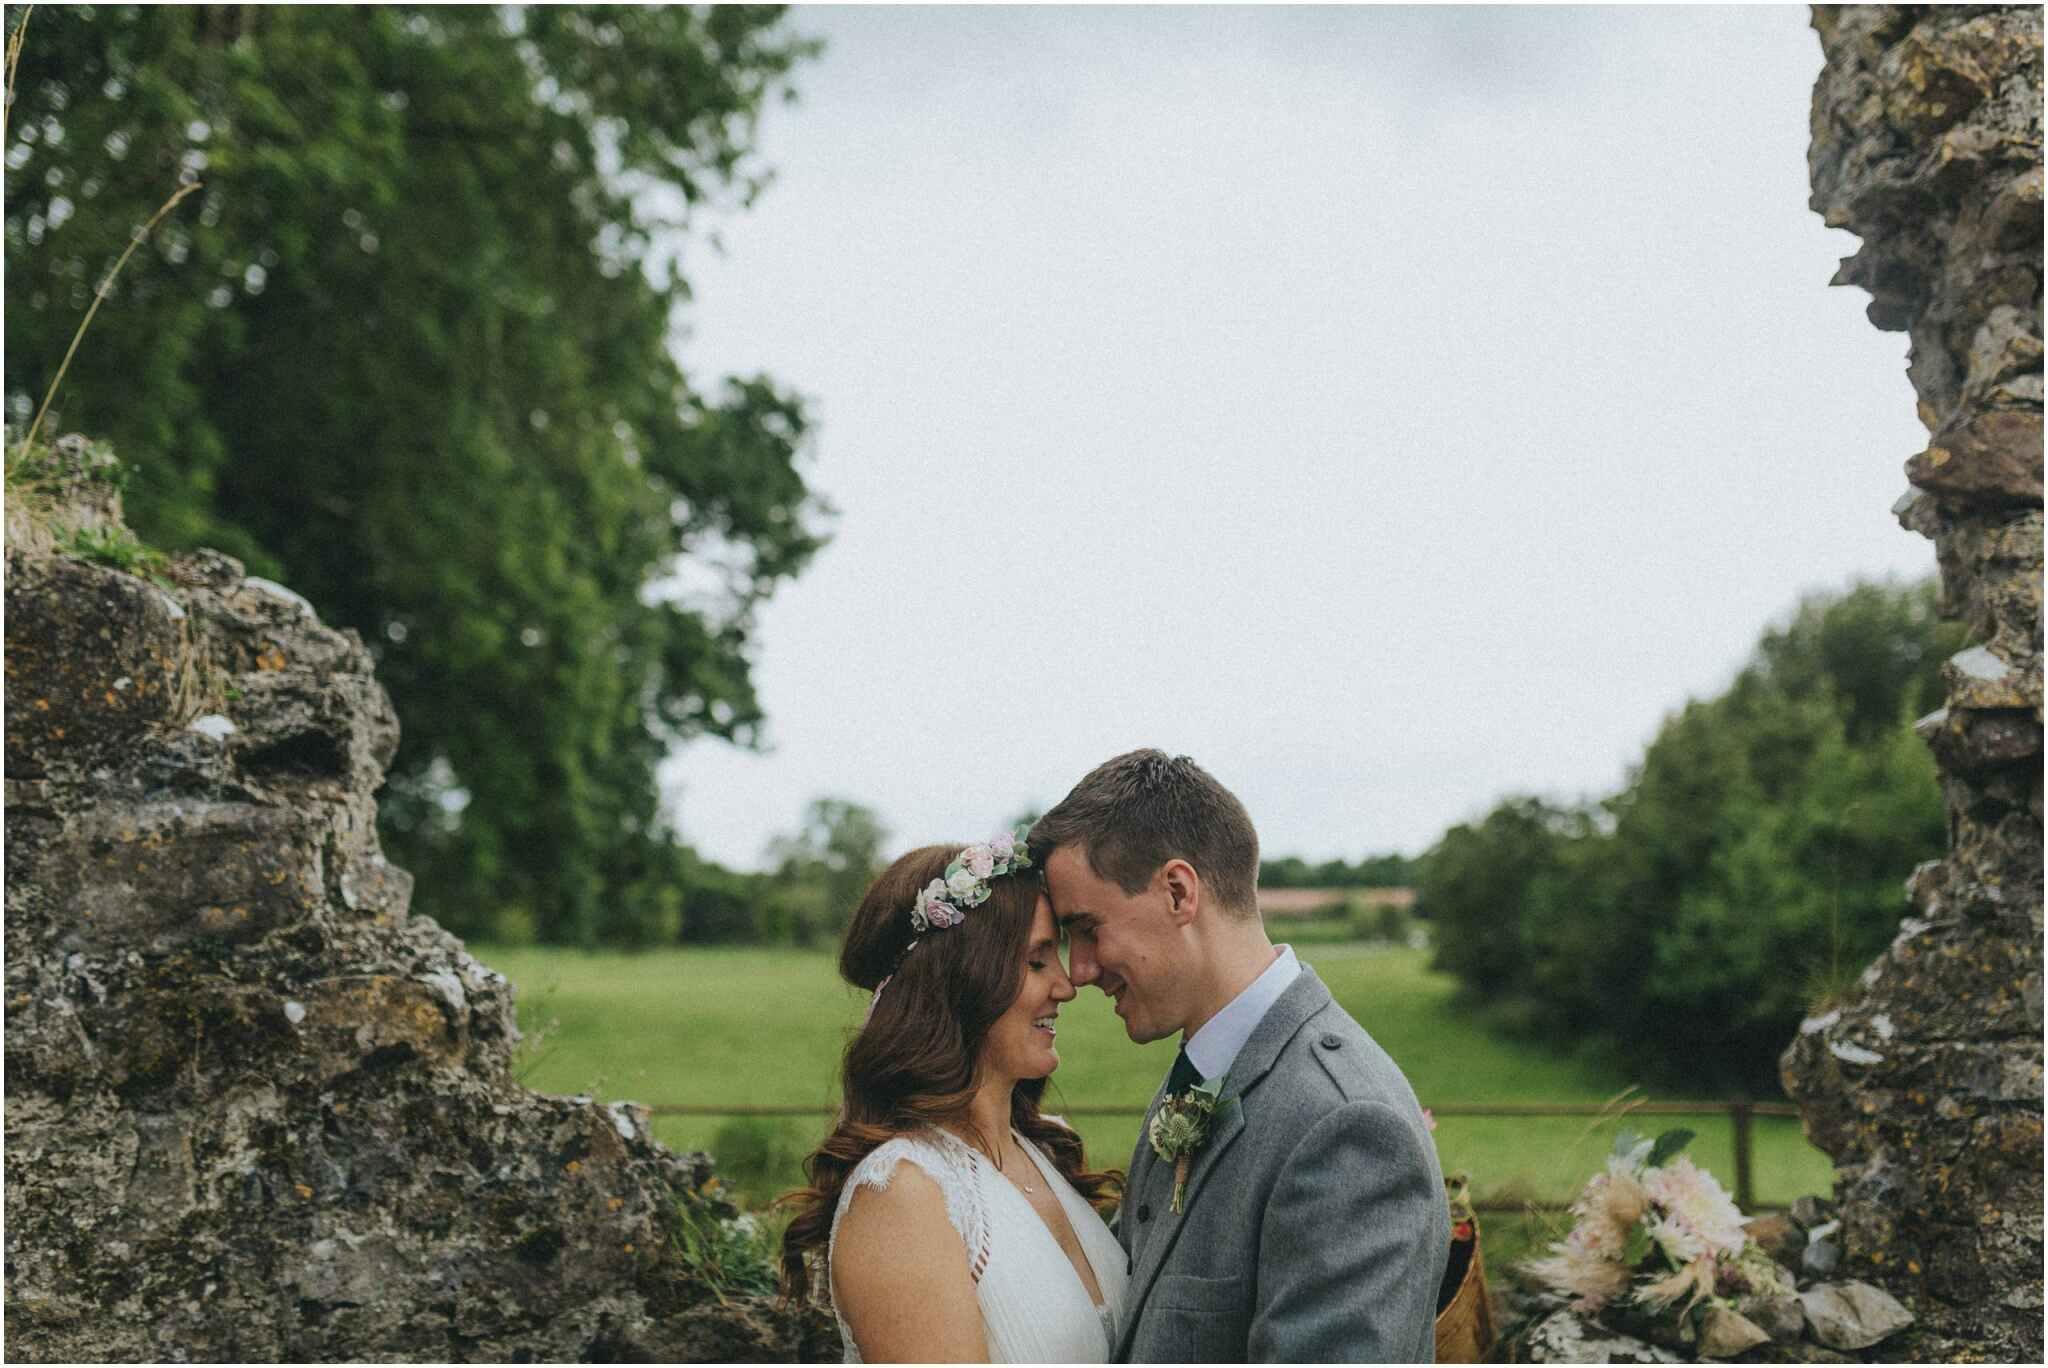 Fionnuala + Paul - Mount Druid Alternative Wedding 142